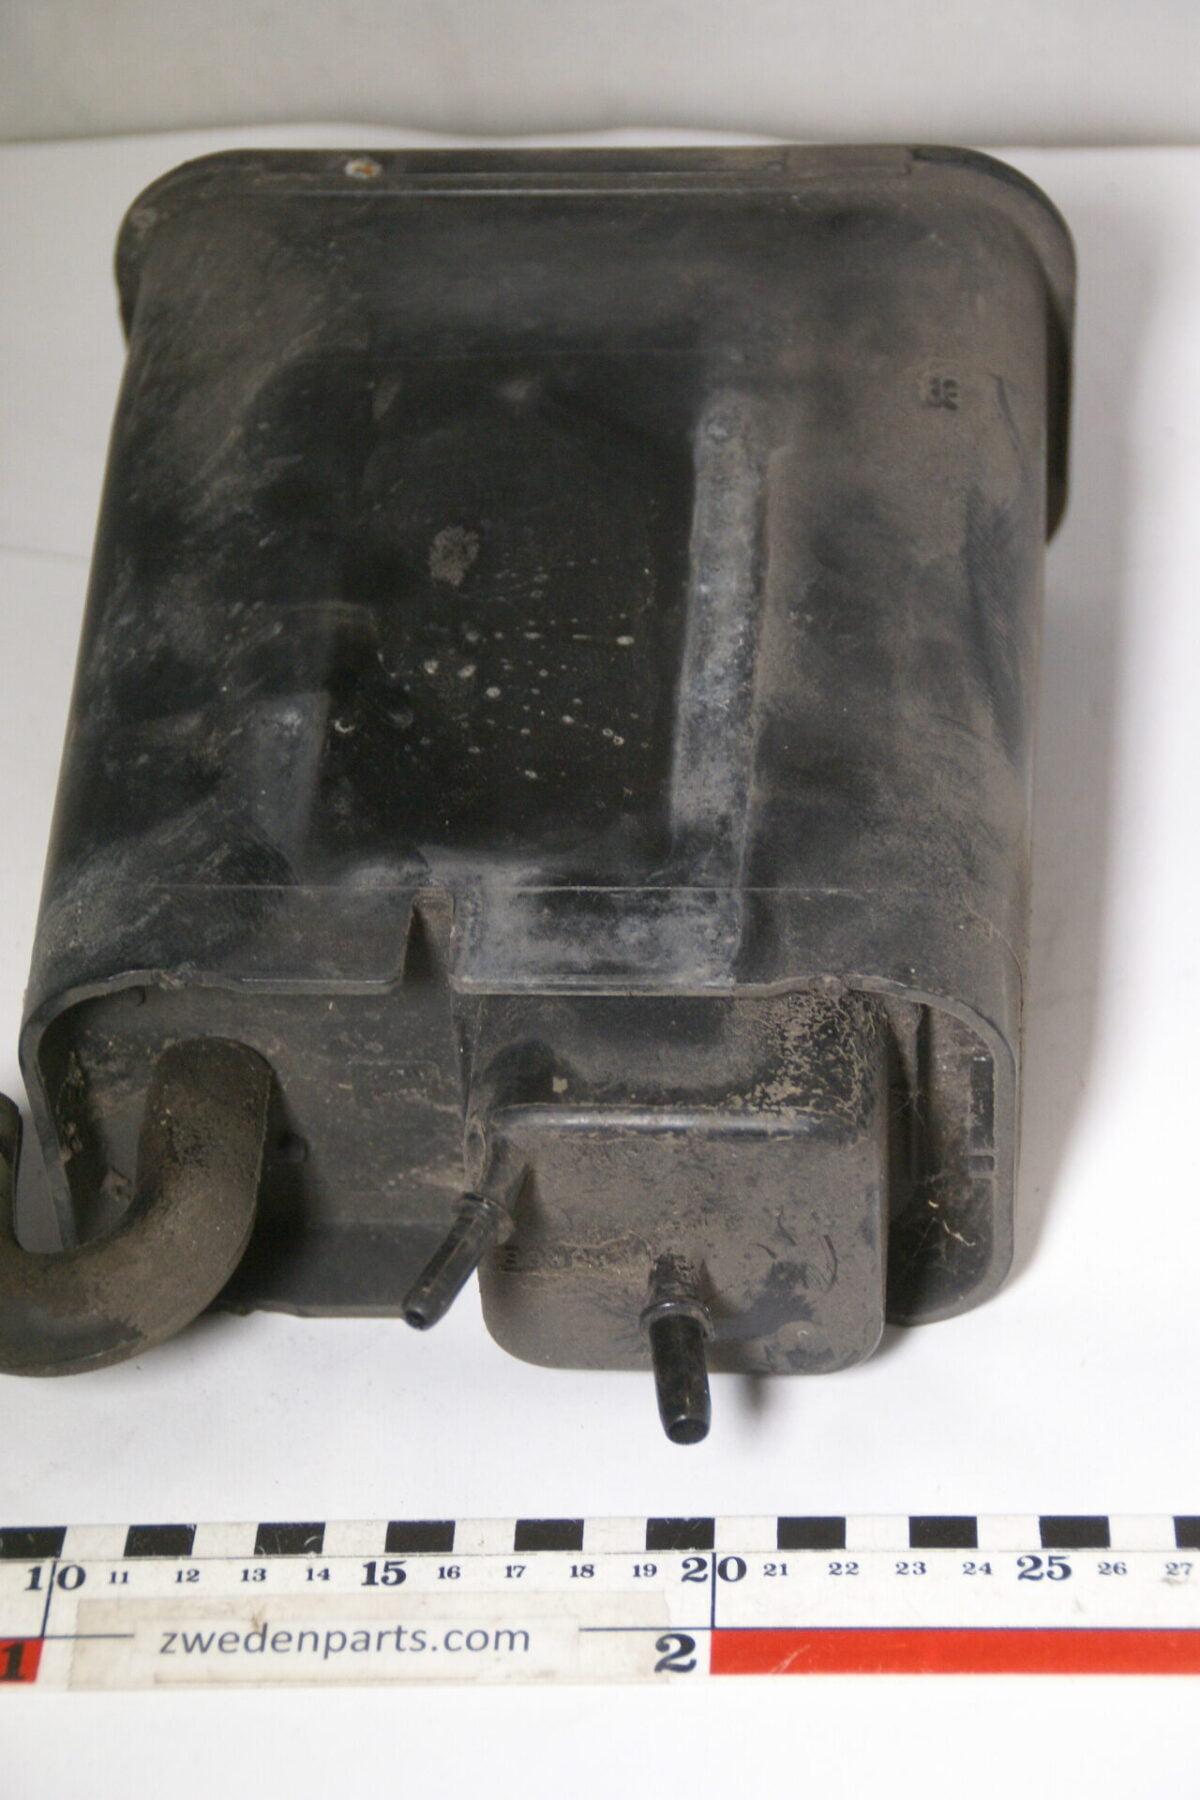 DSC04956 originele vacuumbox achteras nr. 17203256 Volvo SV70II-86c997ff